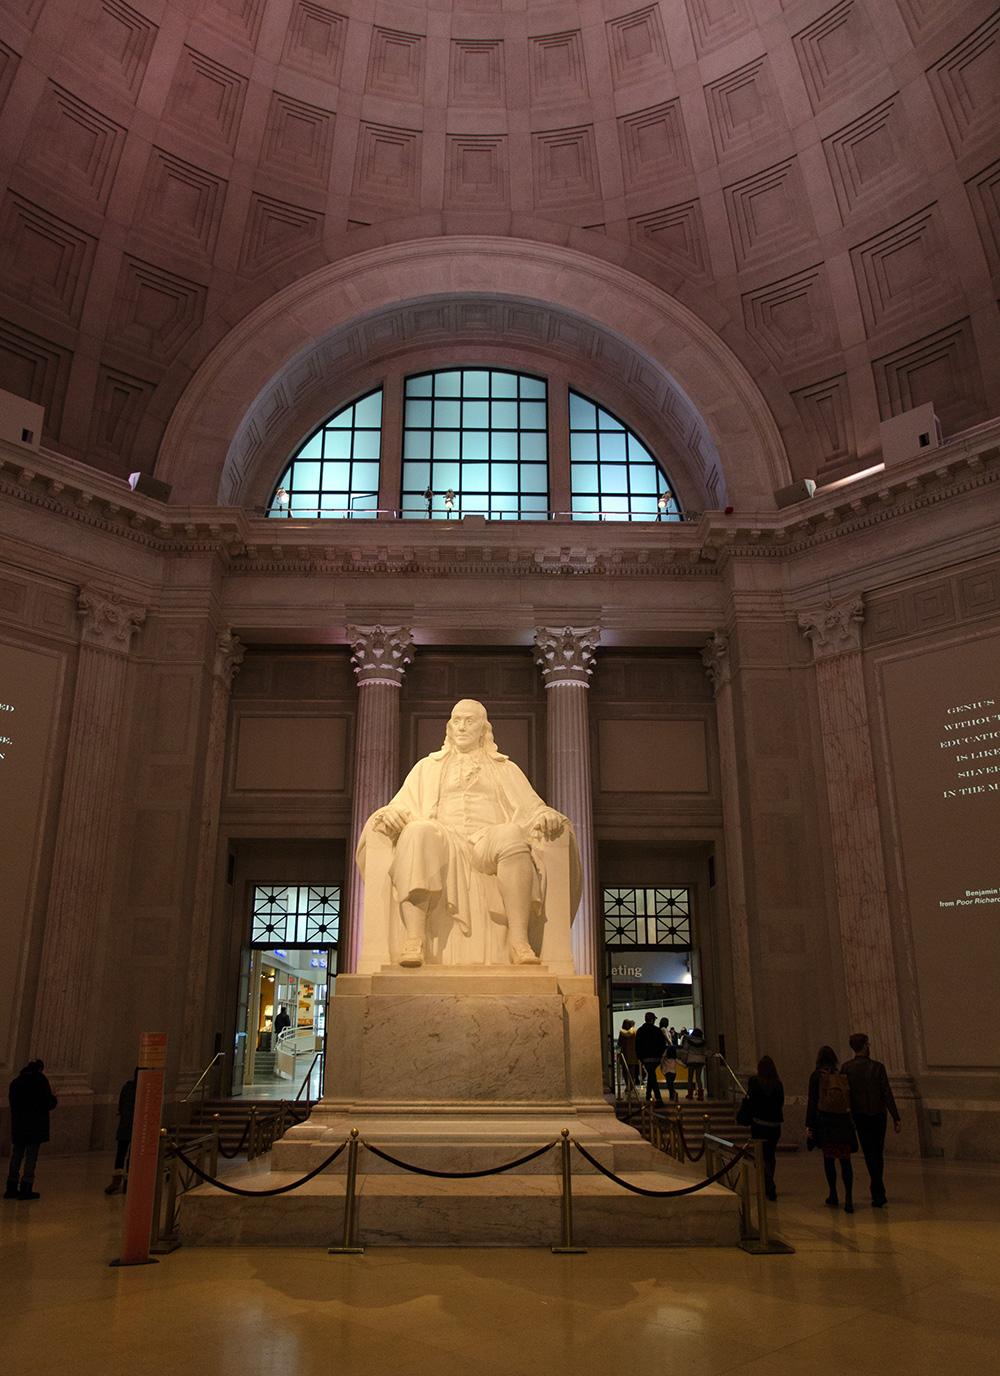 20-foot high Ben Franklin statue at The Franklin Institute in Philadelphia.